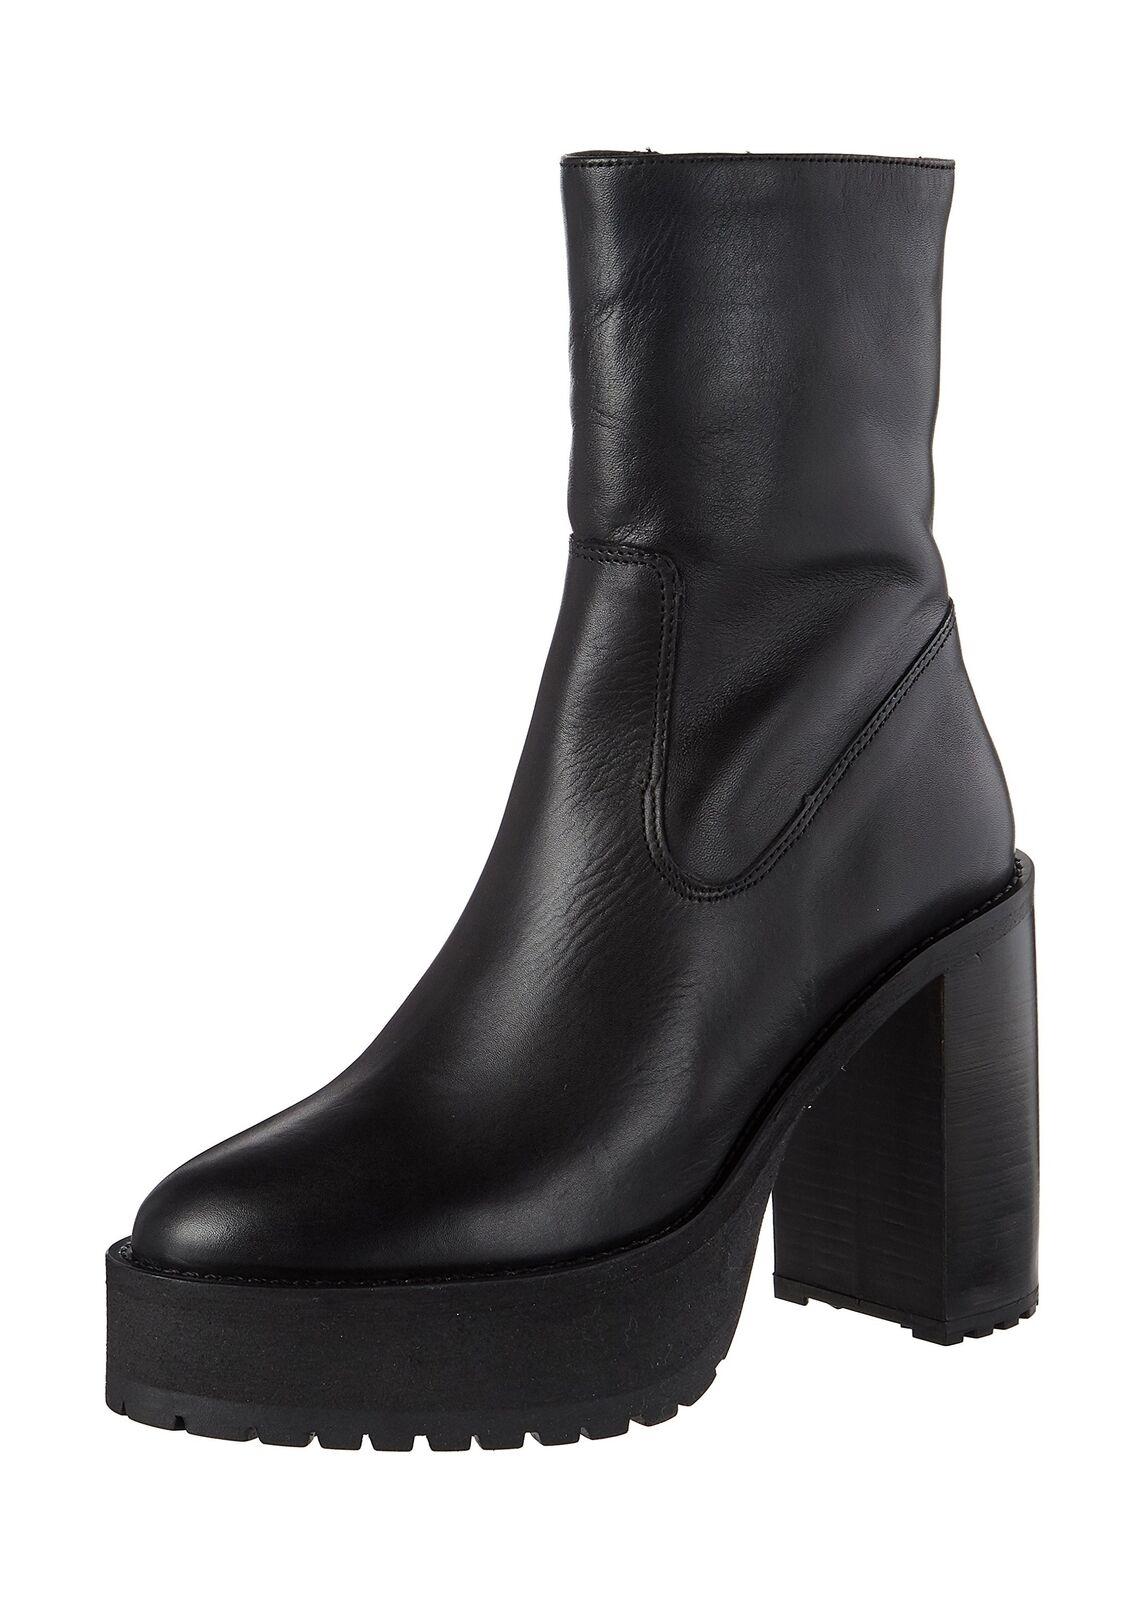 Buffalo Femme ES 30990 Floride Bottes Noir (Preto 01 0) UK 6.5